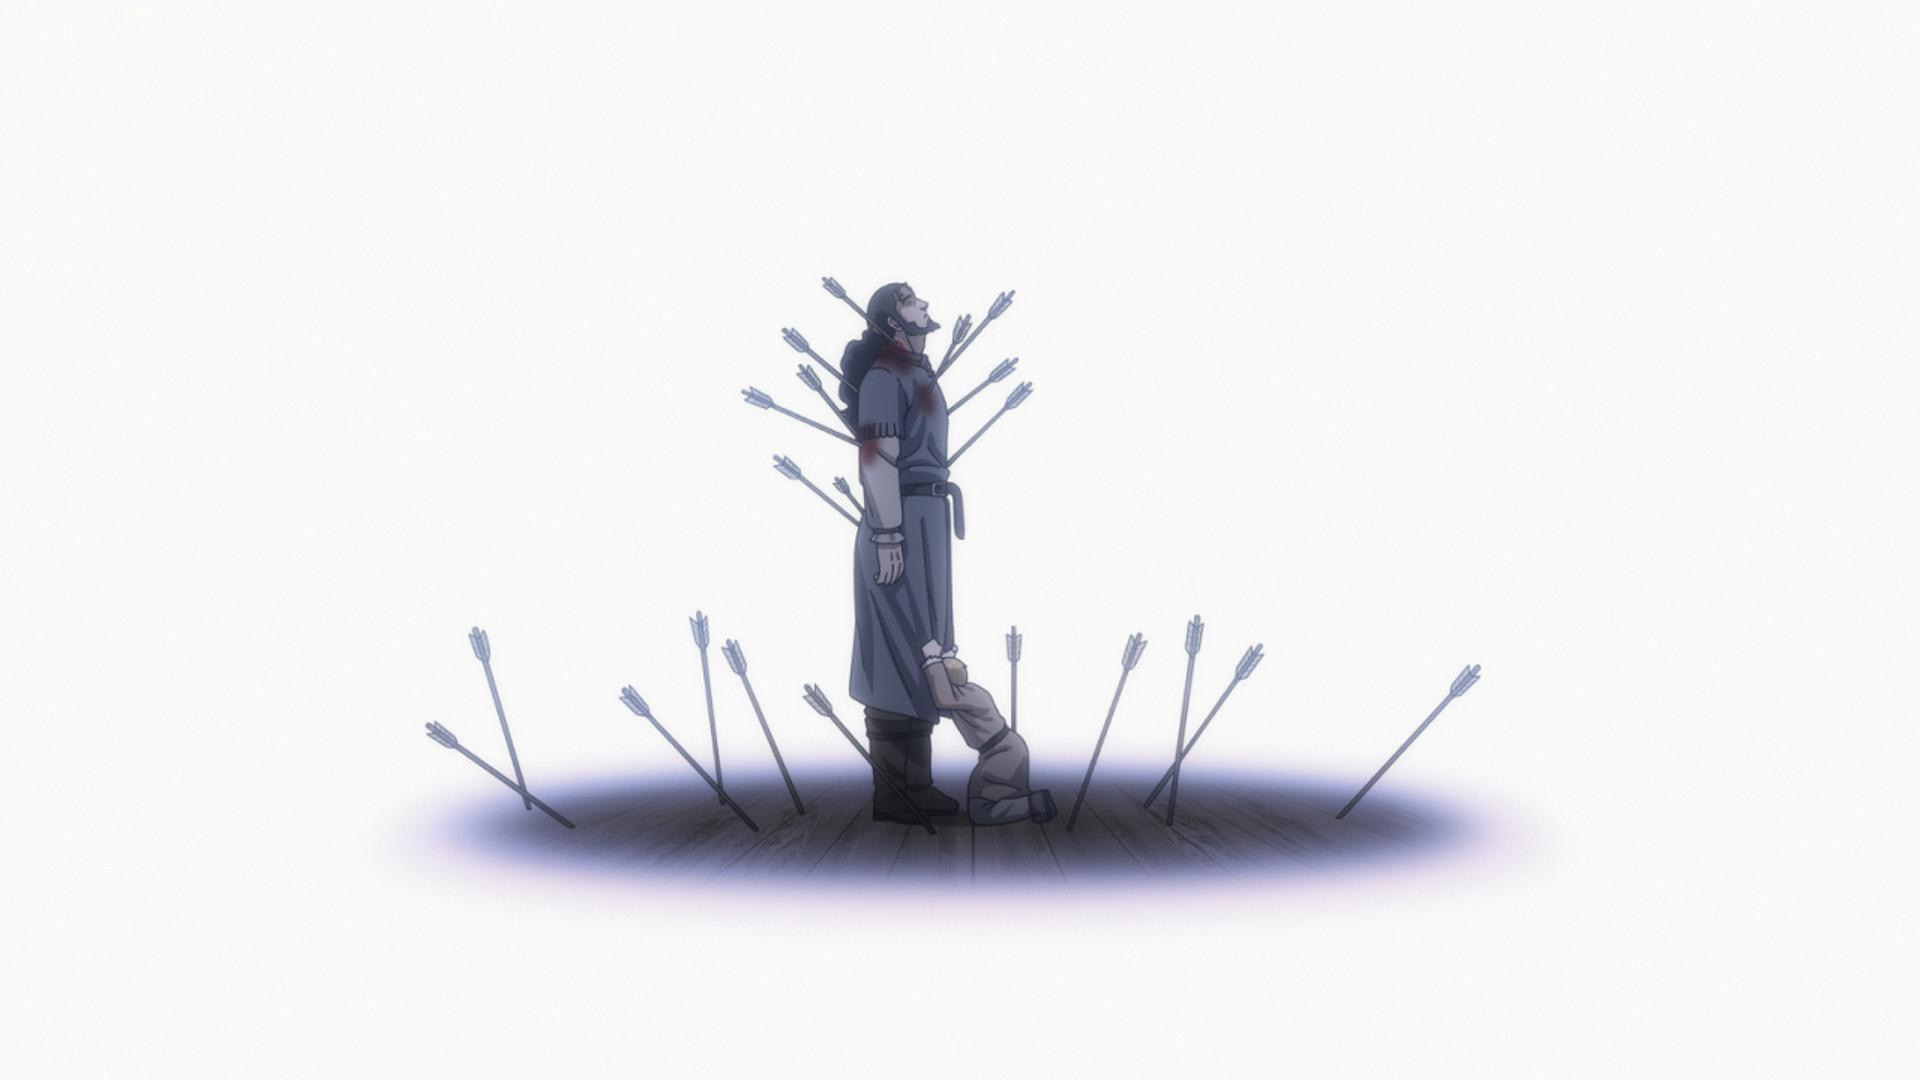 Vinland Saga Episode 4 Discussion - Forums - MyAnimeList.net